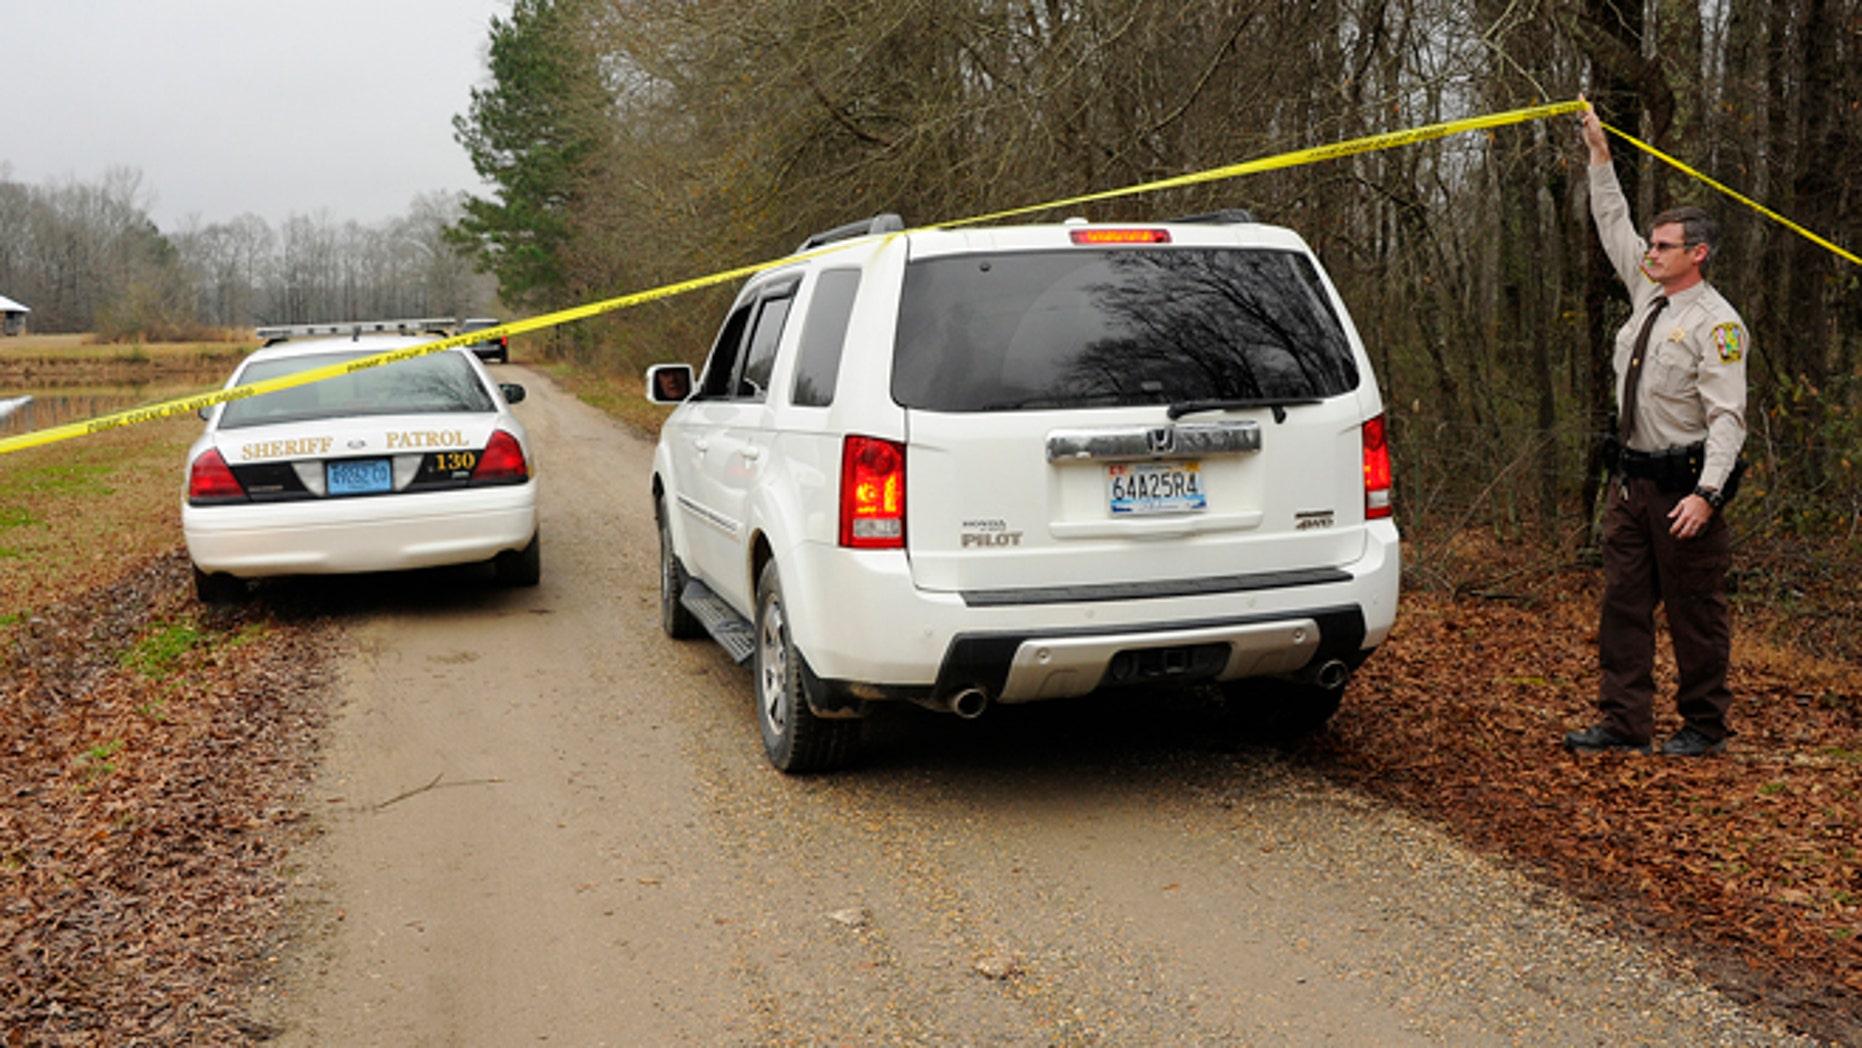 Alabama teenager killed in plane crash didn't follow regulations